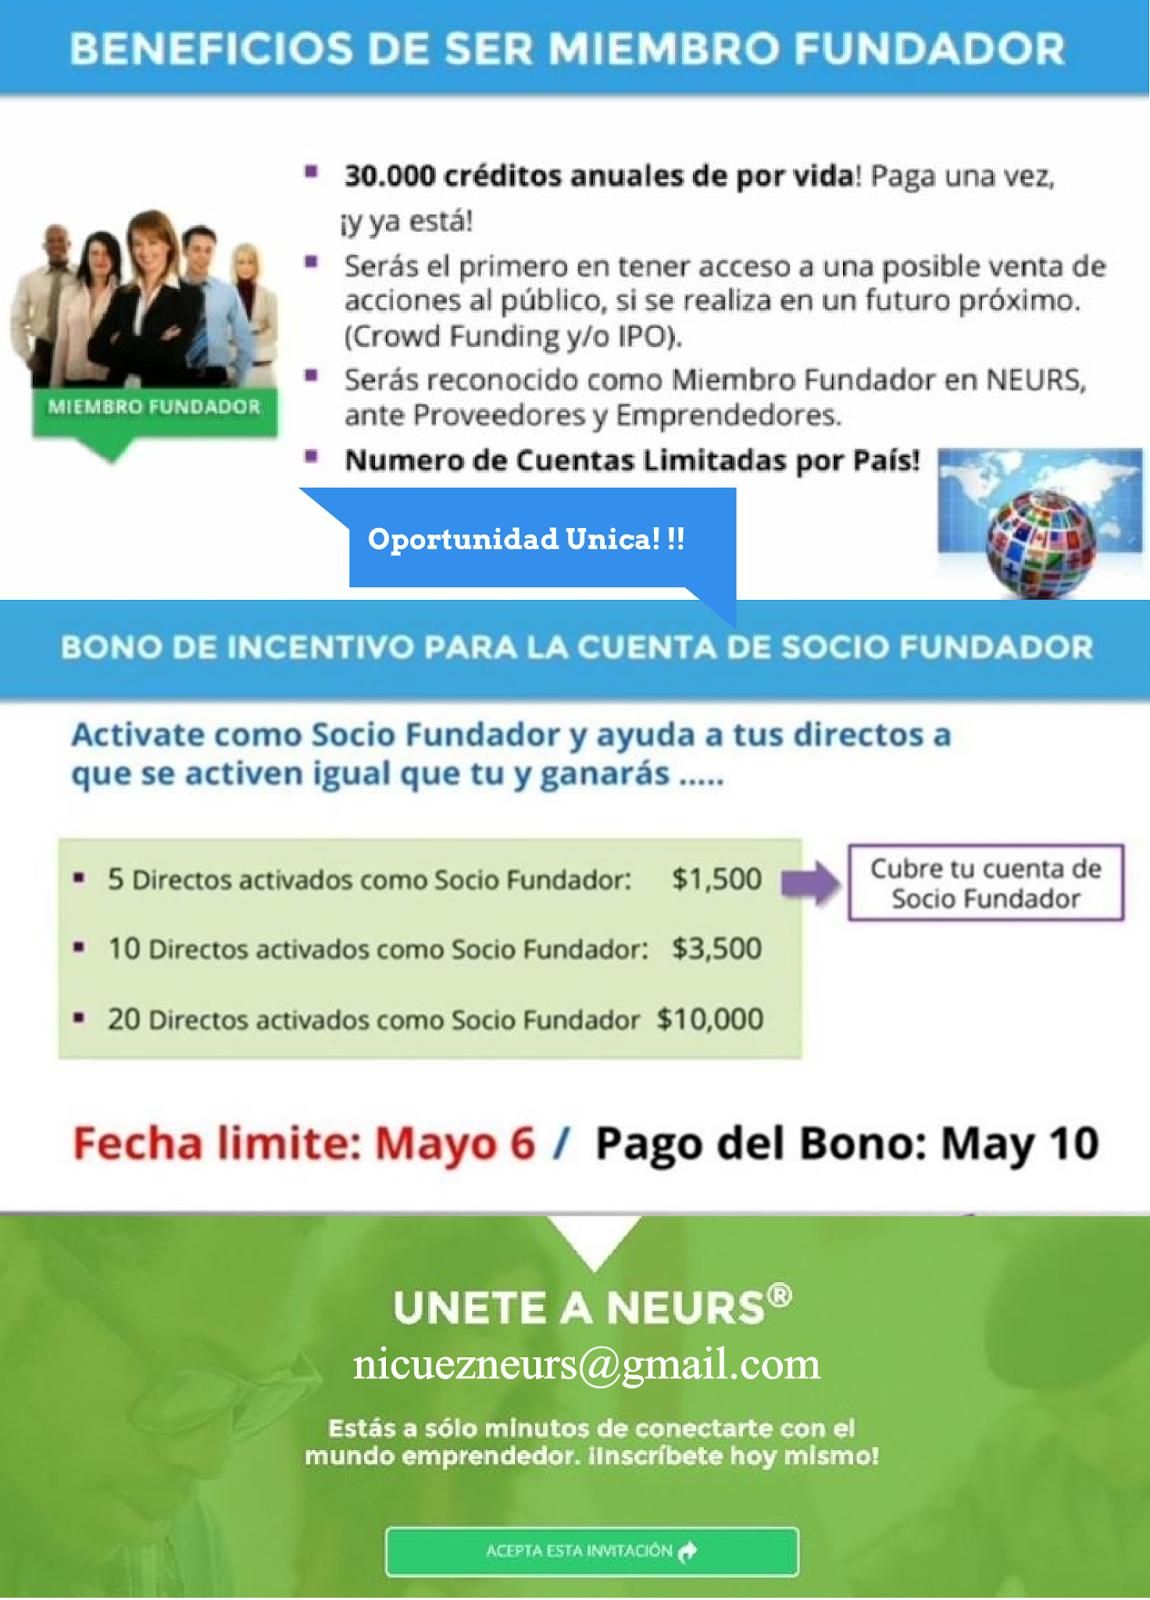 Beneficios Miembro Fundador-Daniel Nicuez